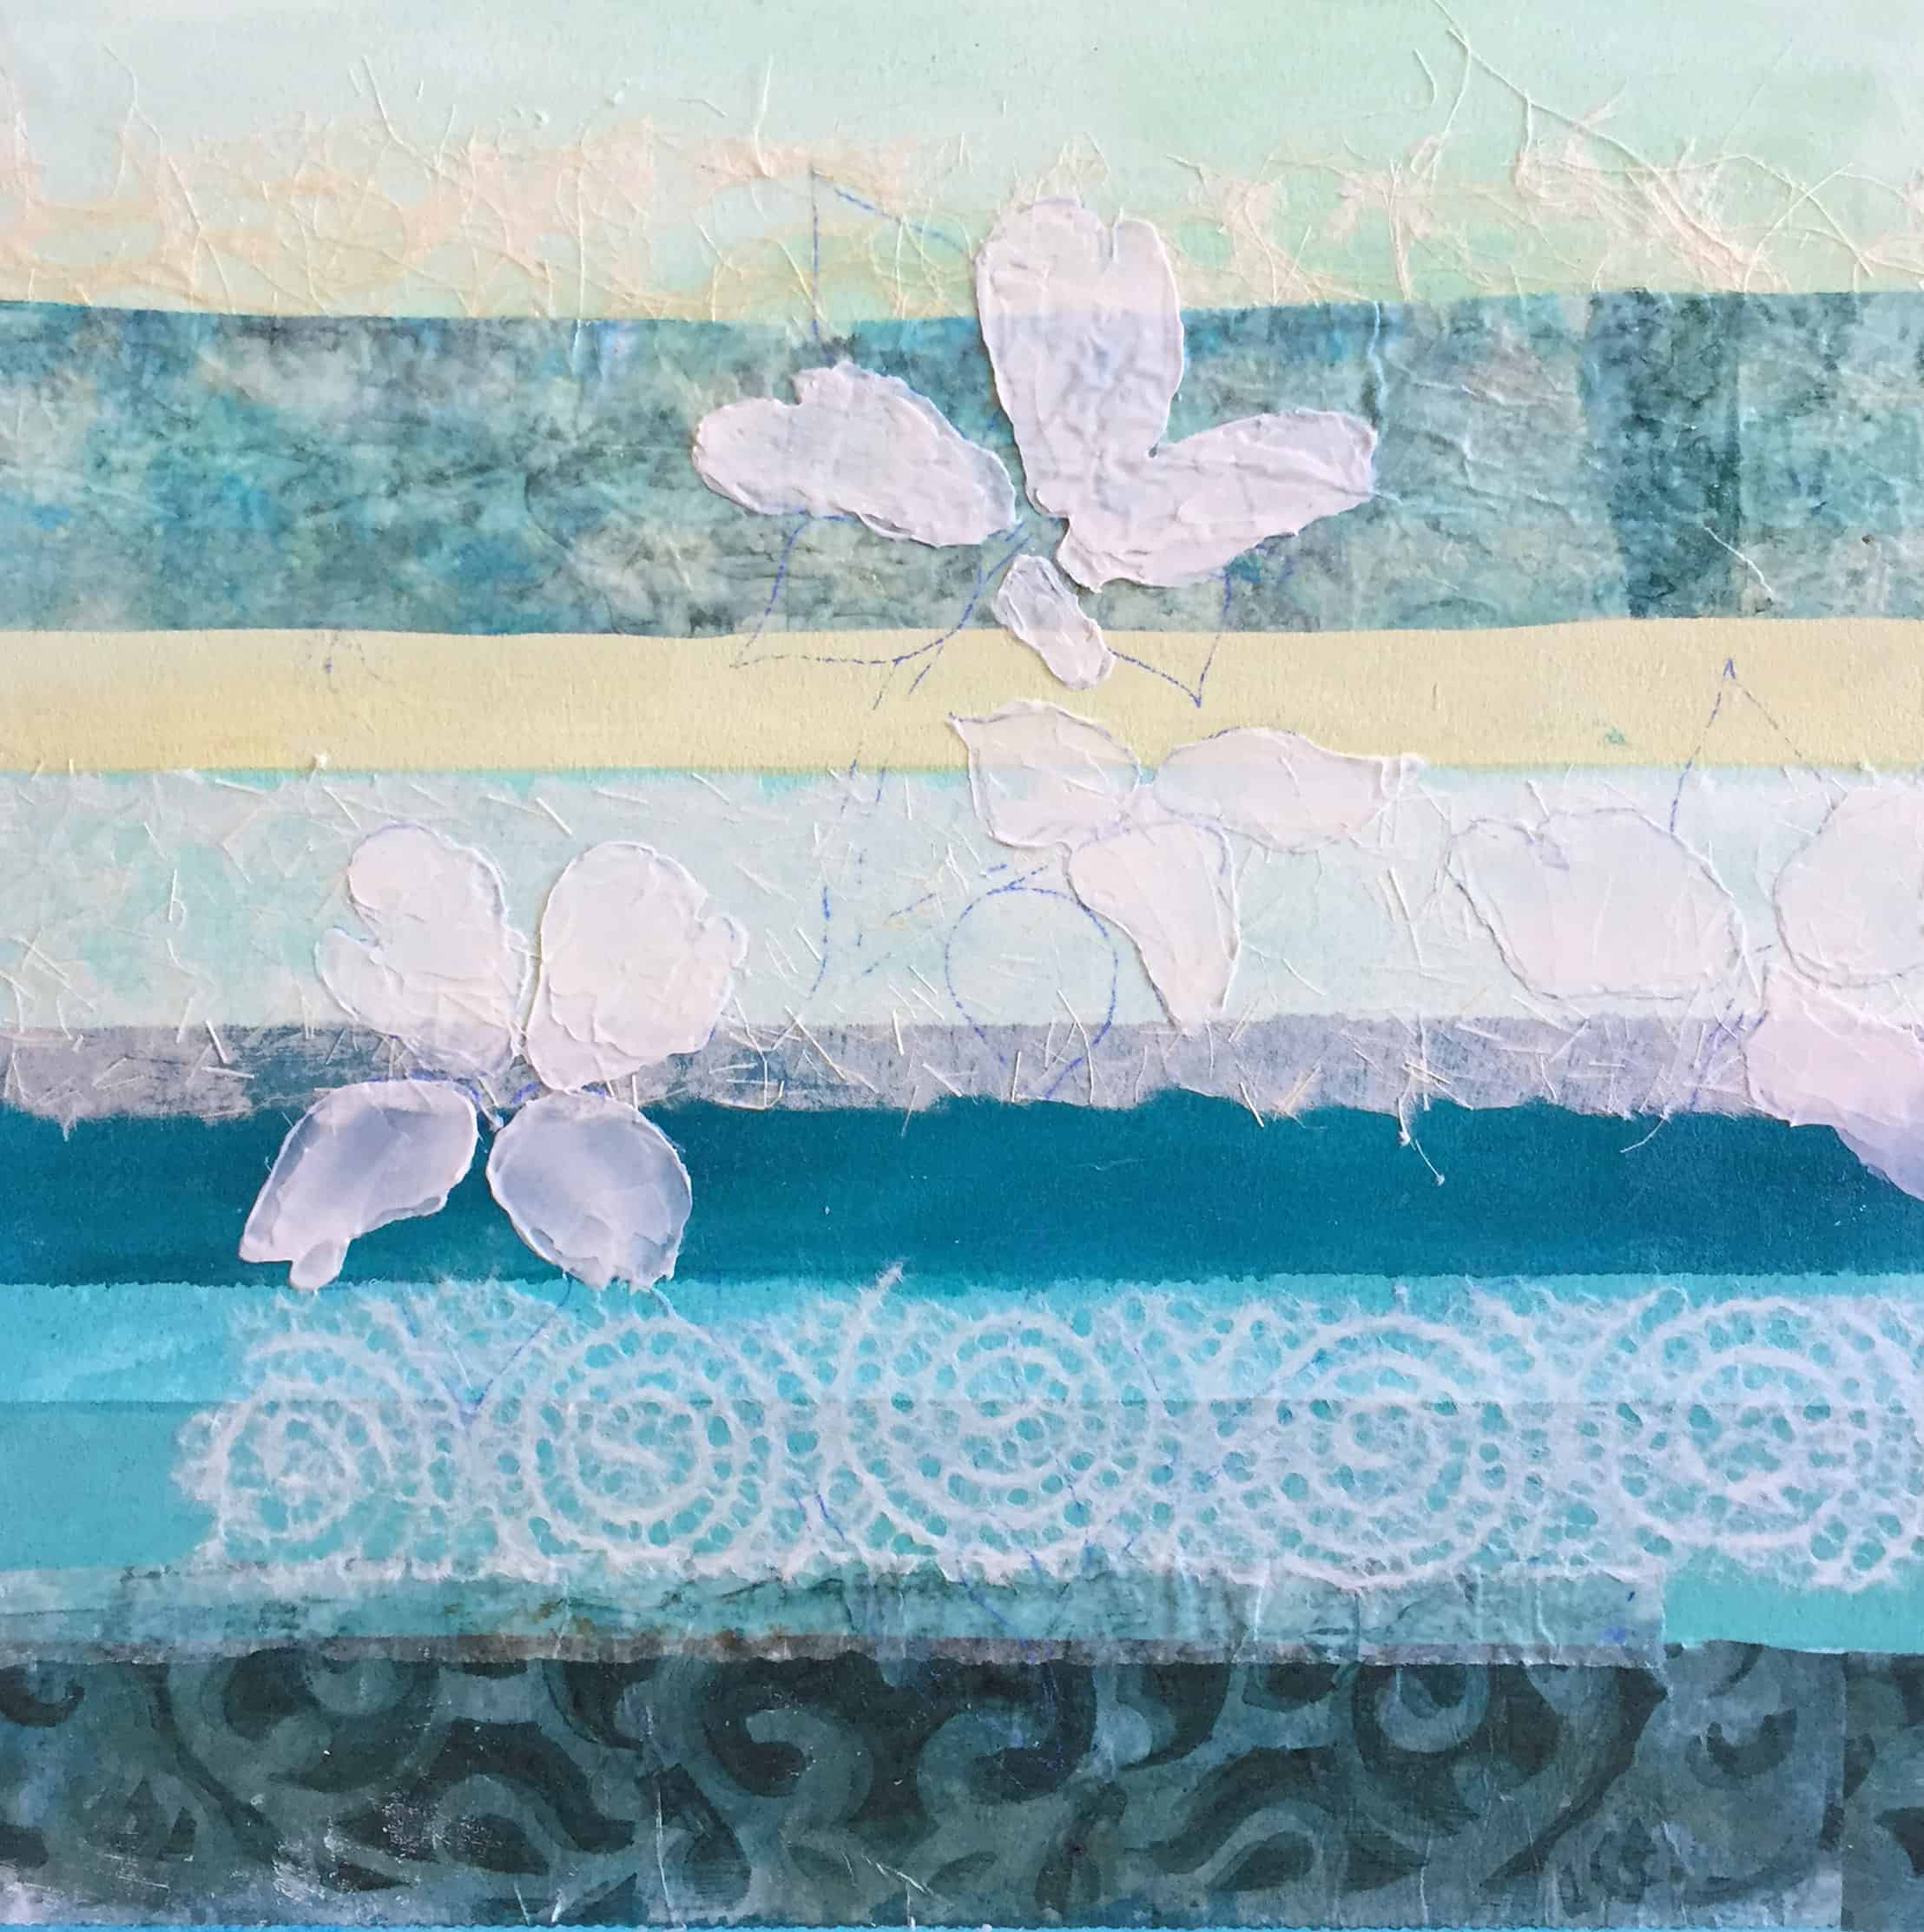 A glimpse inside my creative process — Kathy Ferguson